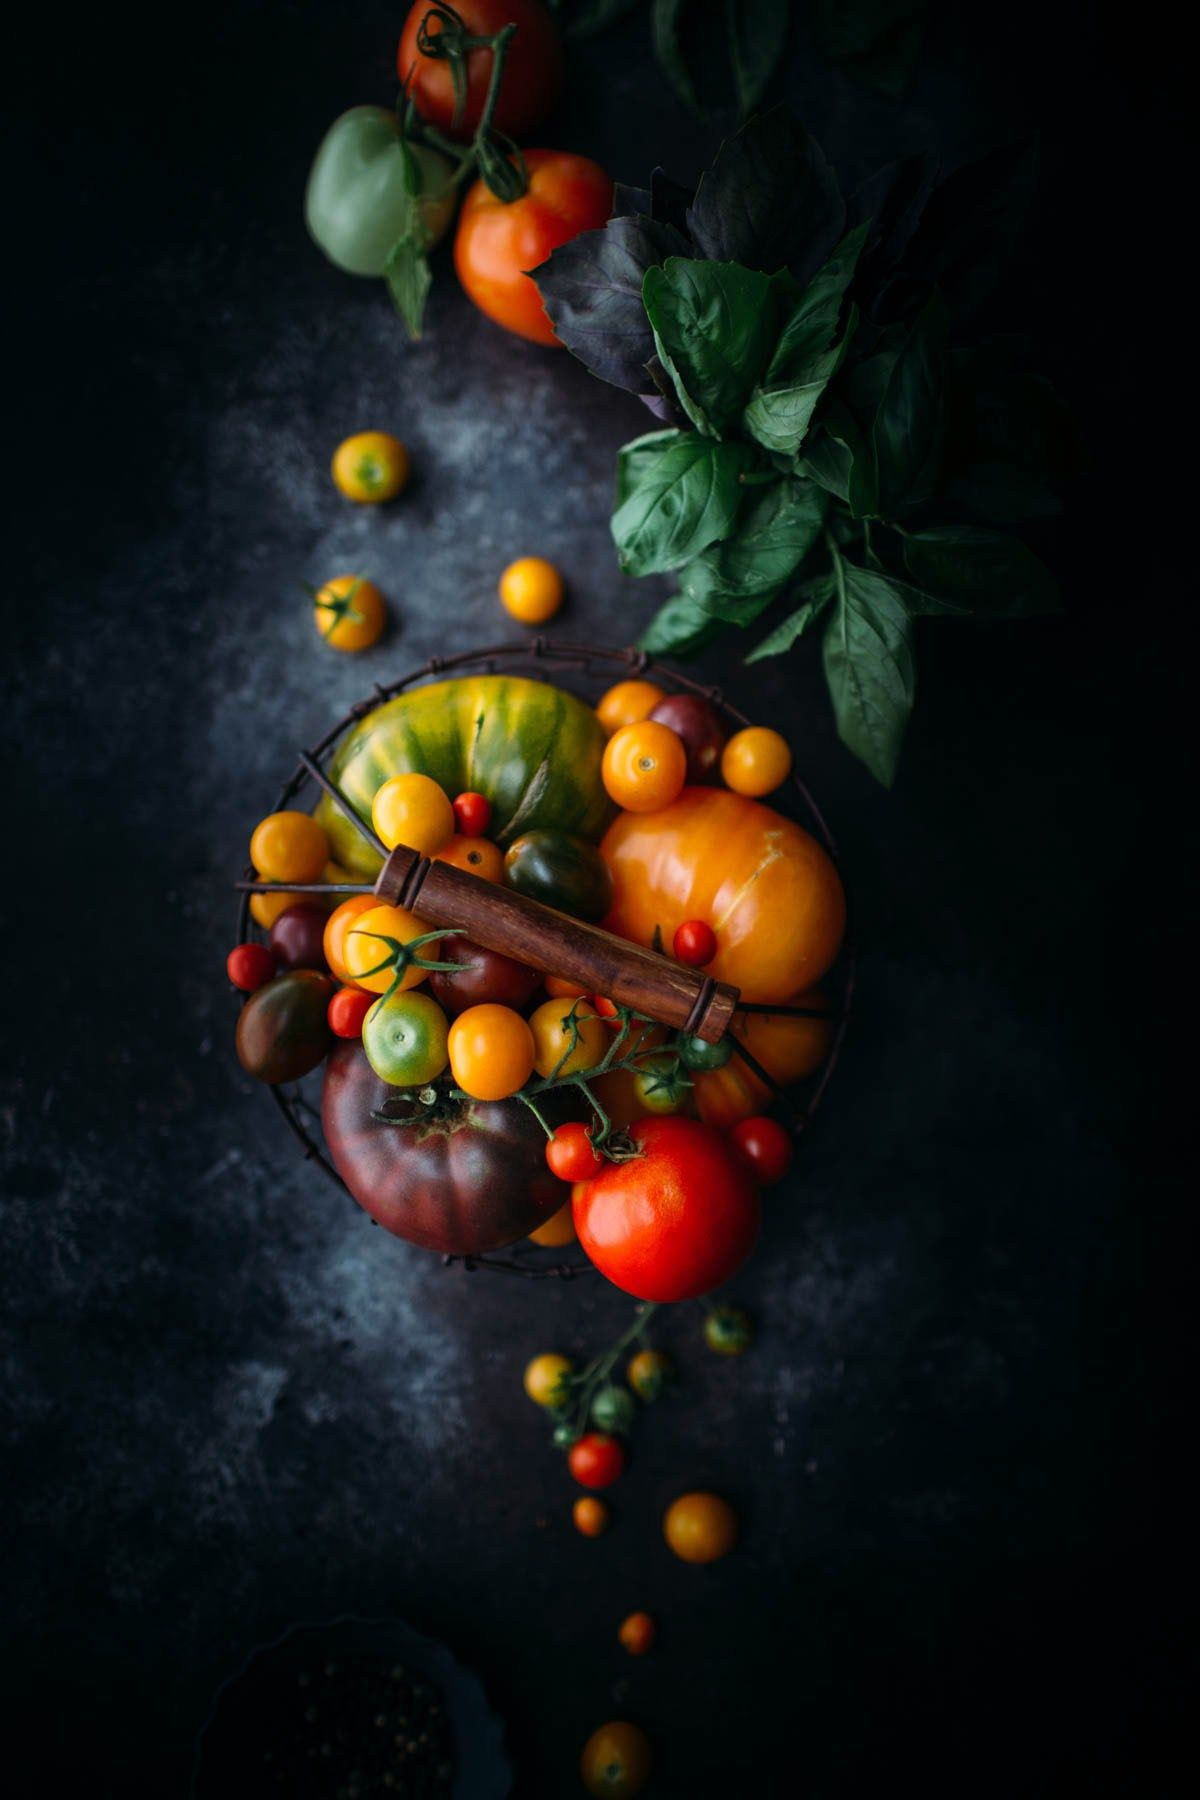 Food Photography - Heirloom Tomatoes